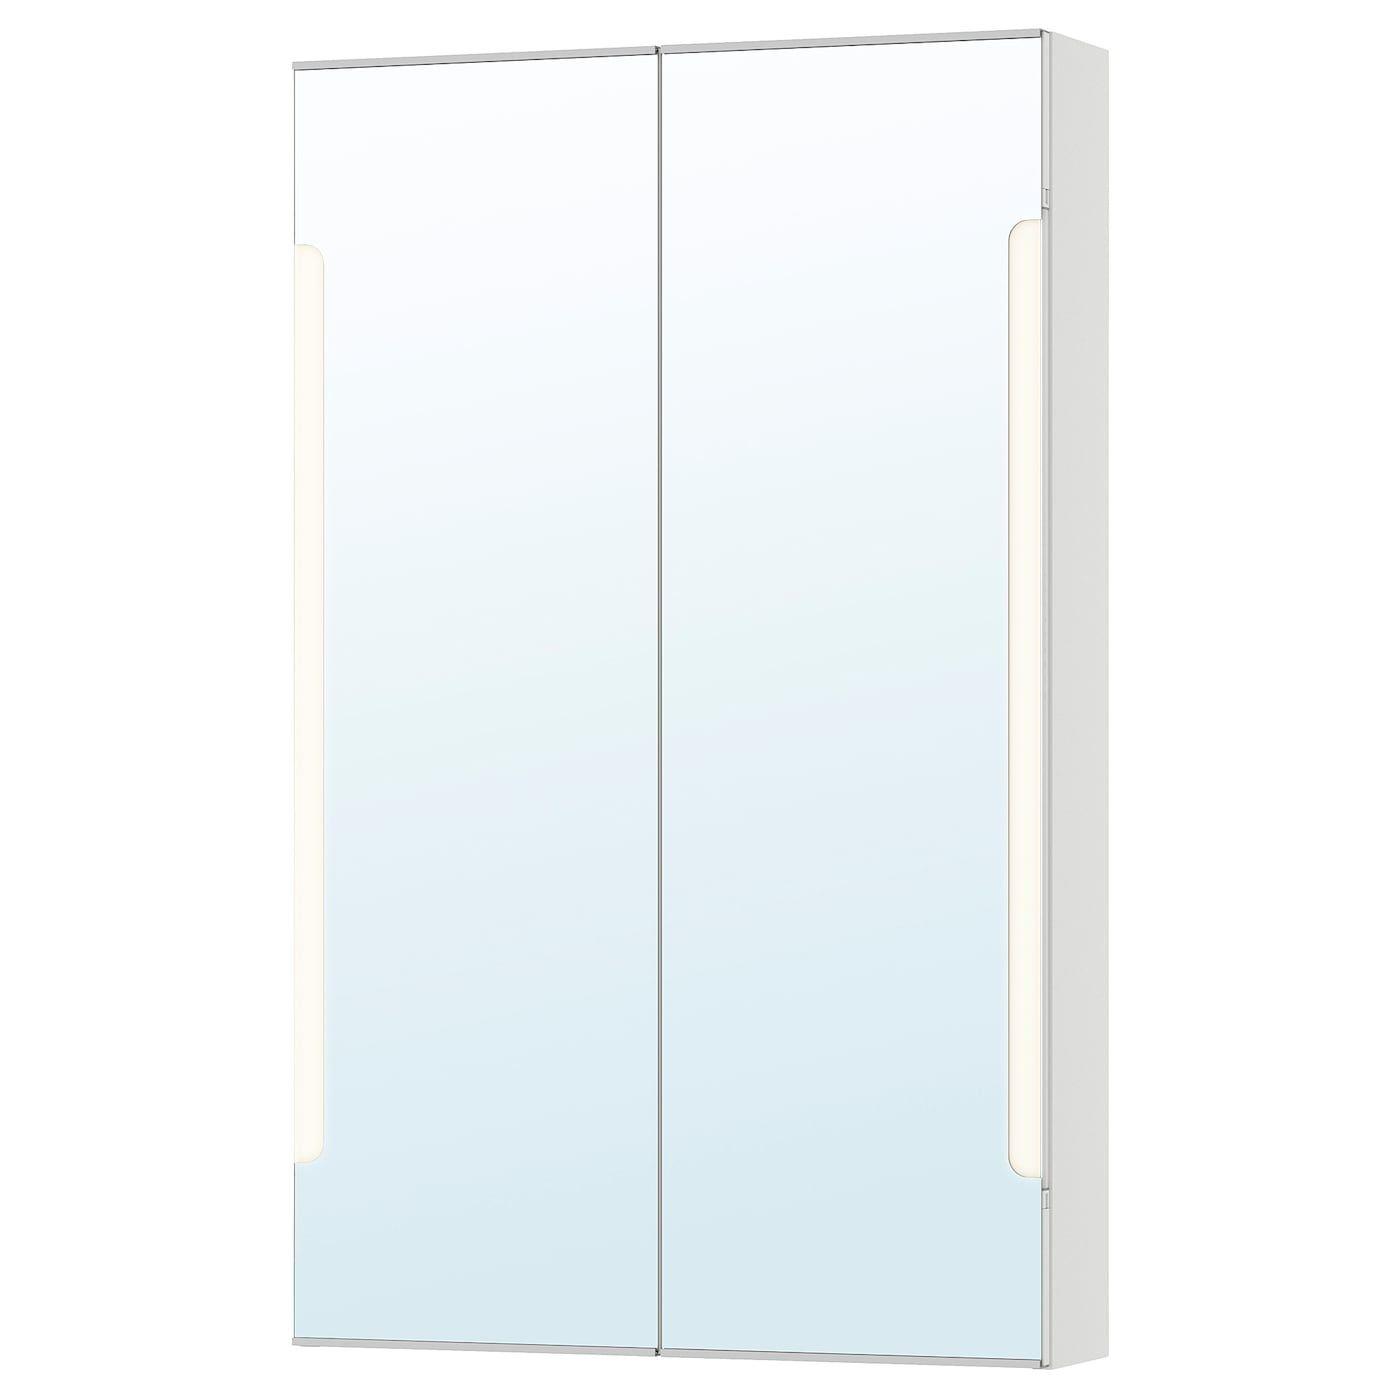 Storjorm Spejlskab 2 Lager Integreret Belys Hvid 60x14x96 Cm Ikea In 2020 Mirror Cabinets Mirror Ikea